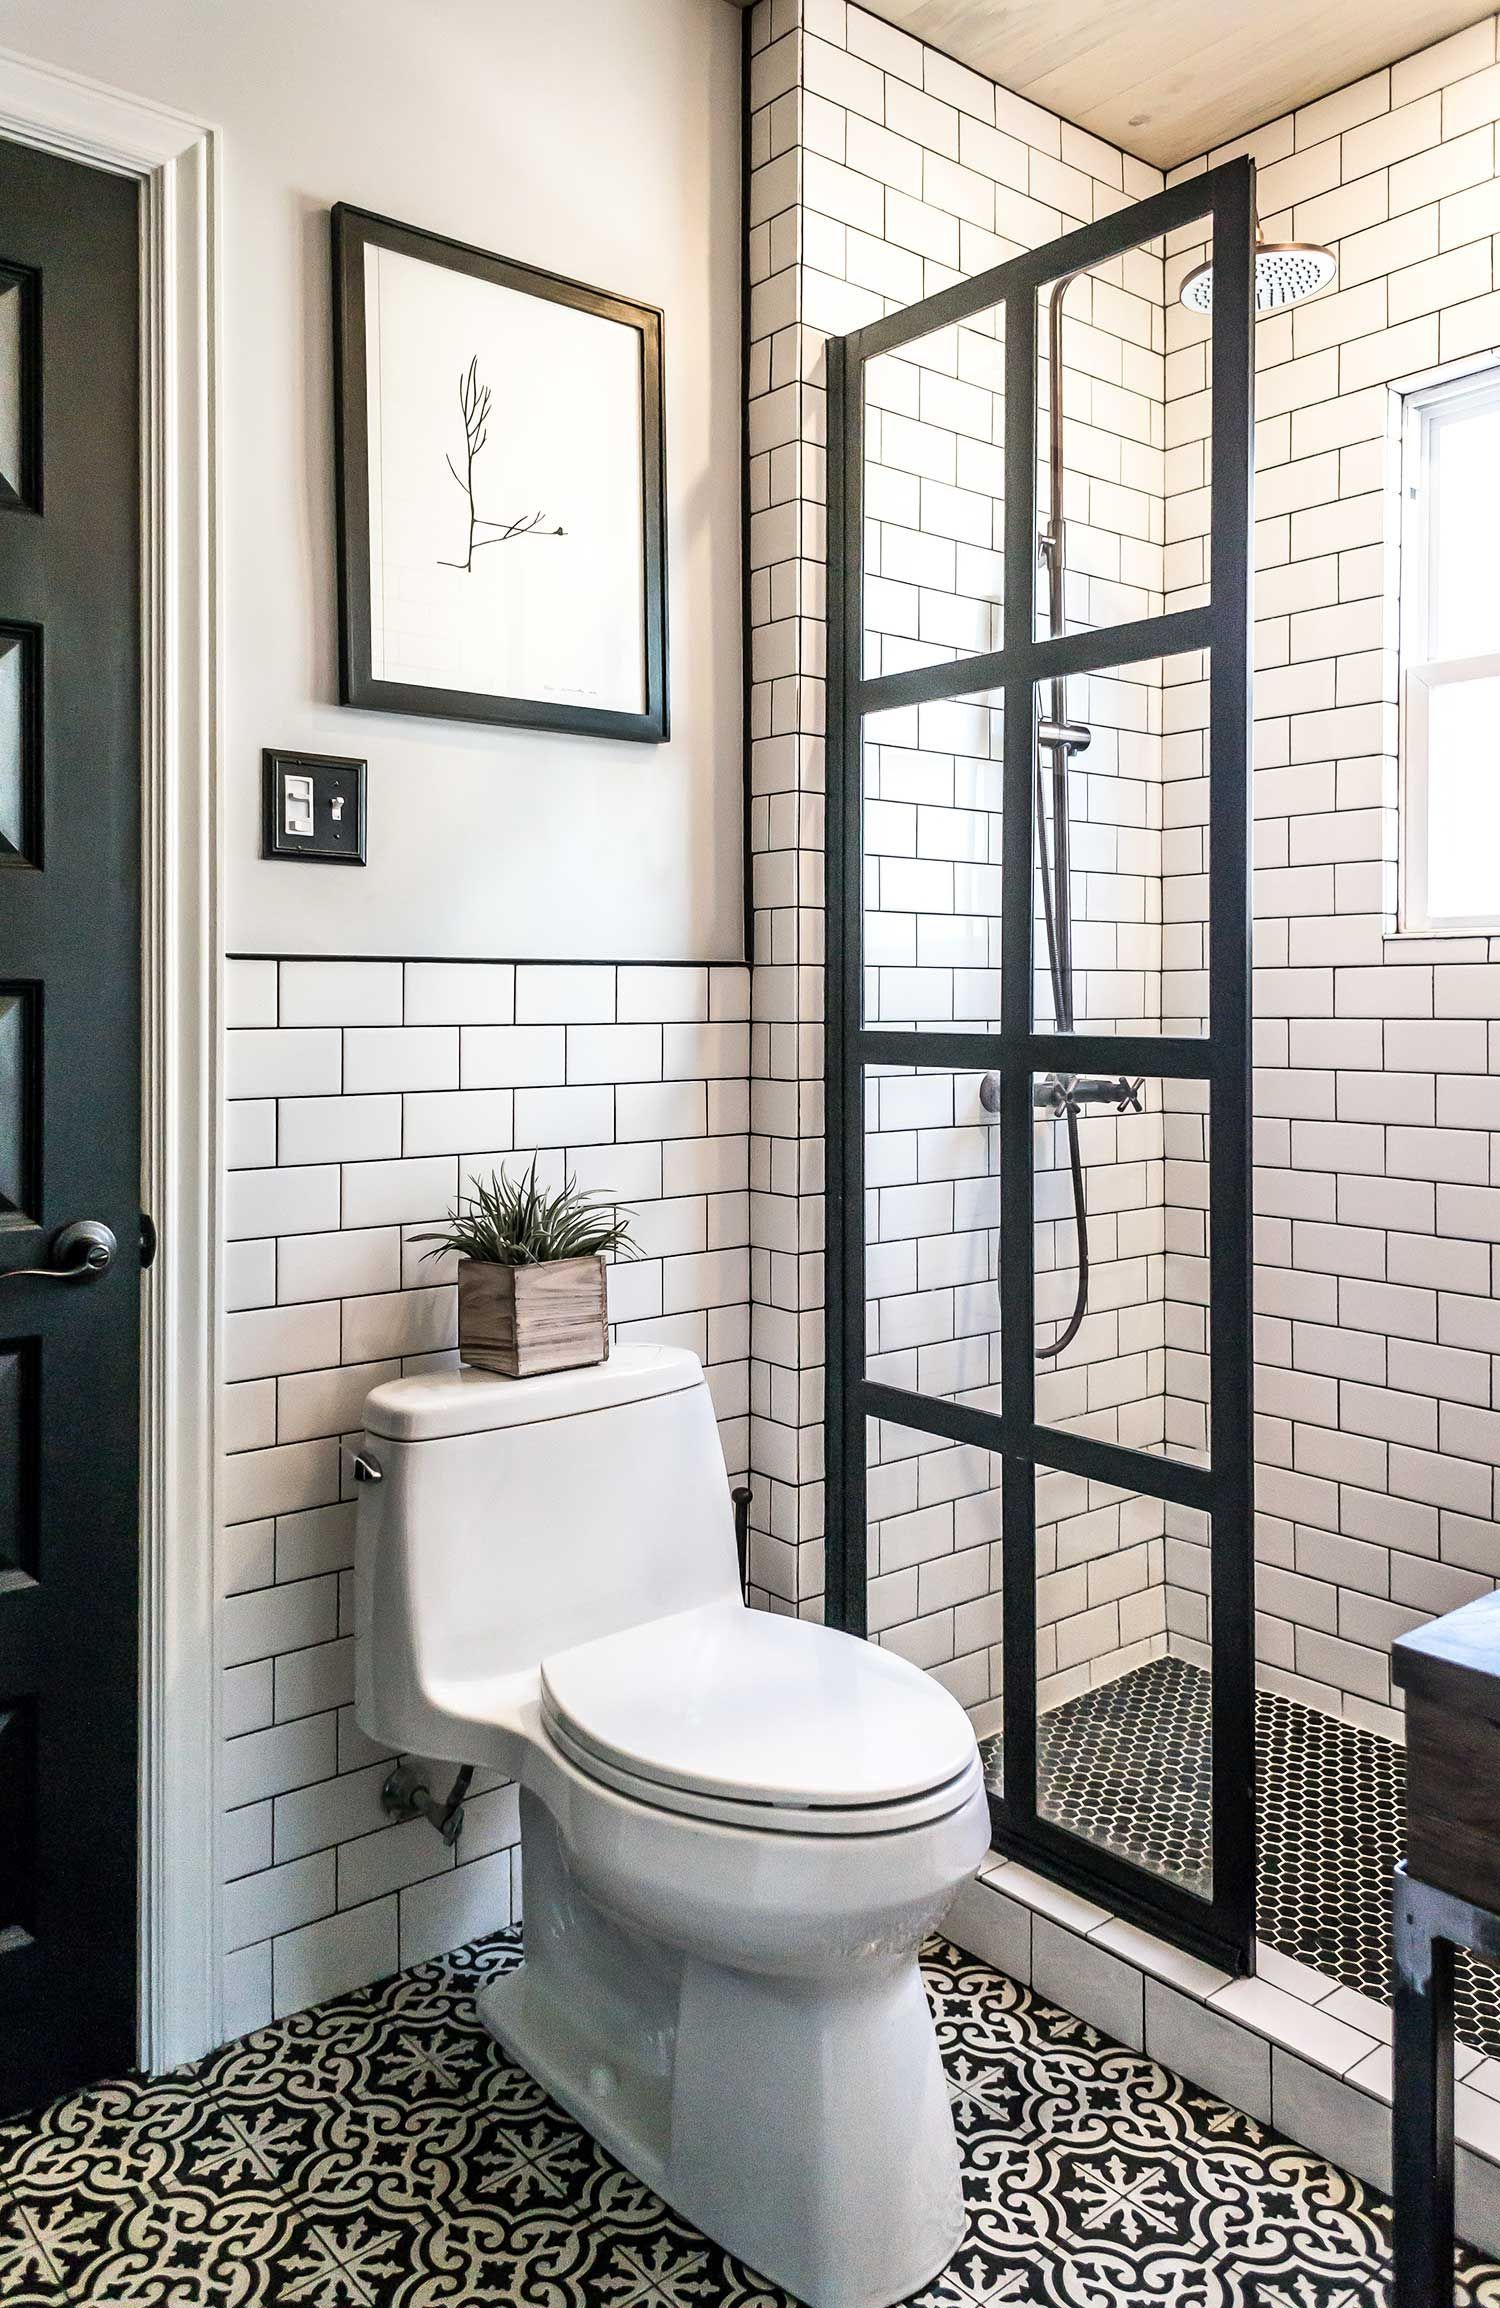 25 Beautiful Small Bathroom Ideas Pinterest Brittany Ph And Met Small Bathroom Remodel Bathroom Design Small Bathroom Remodel Master